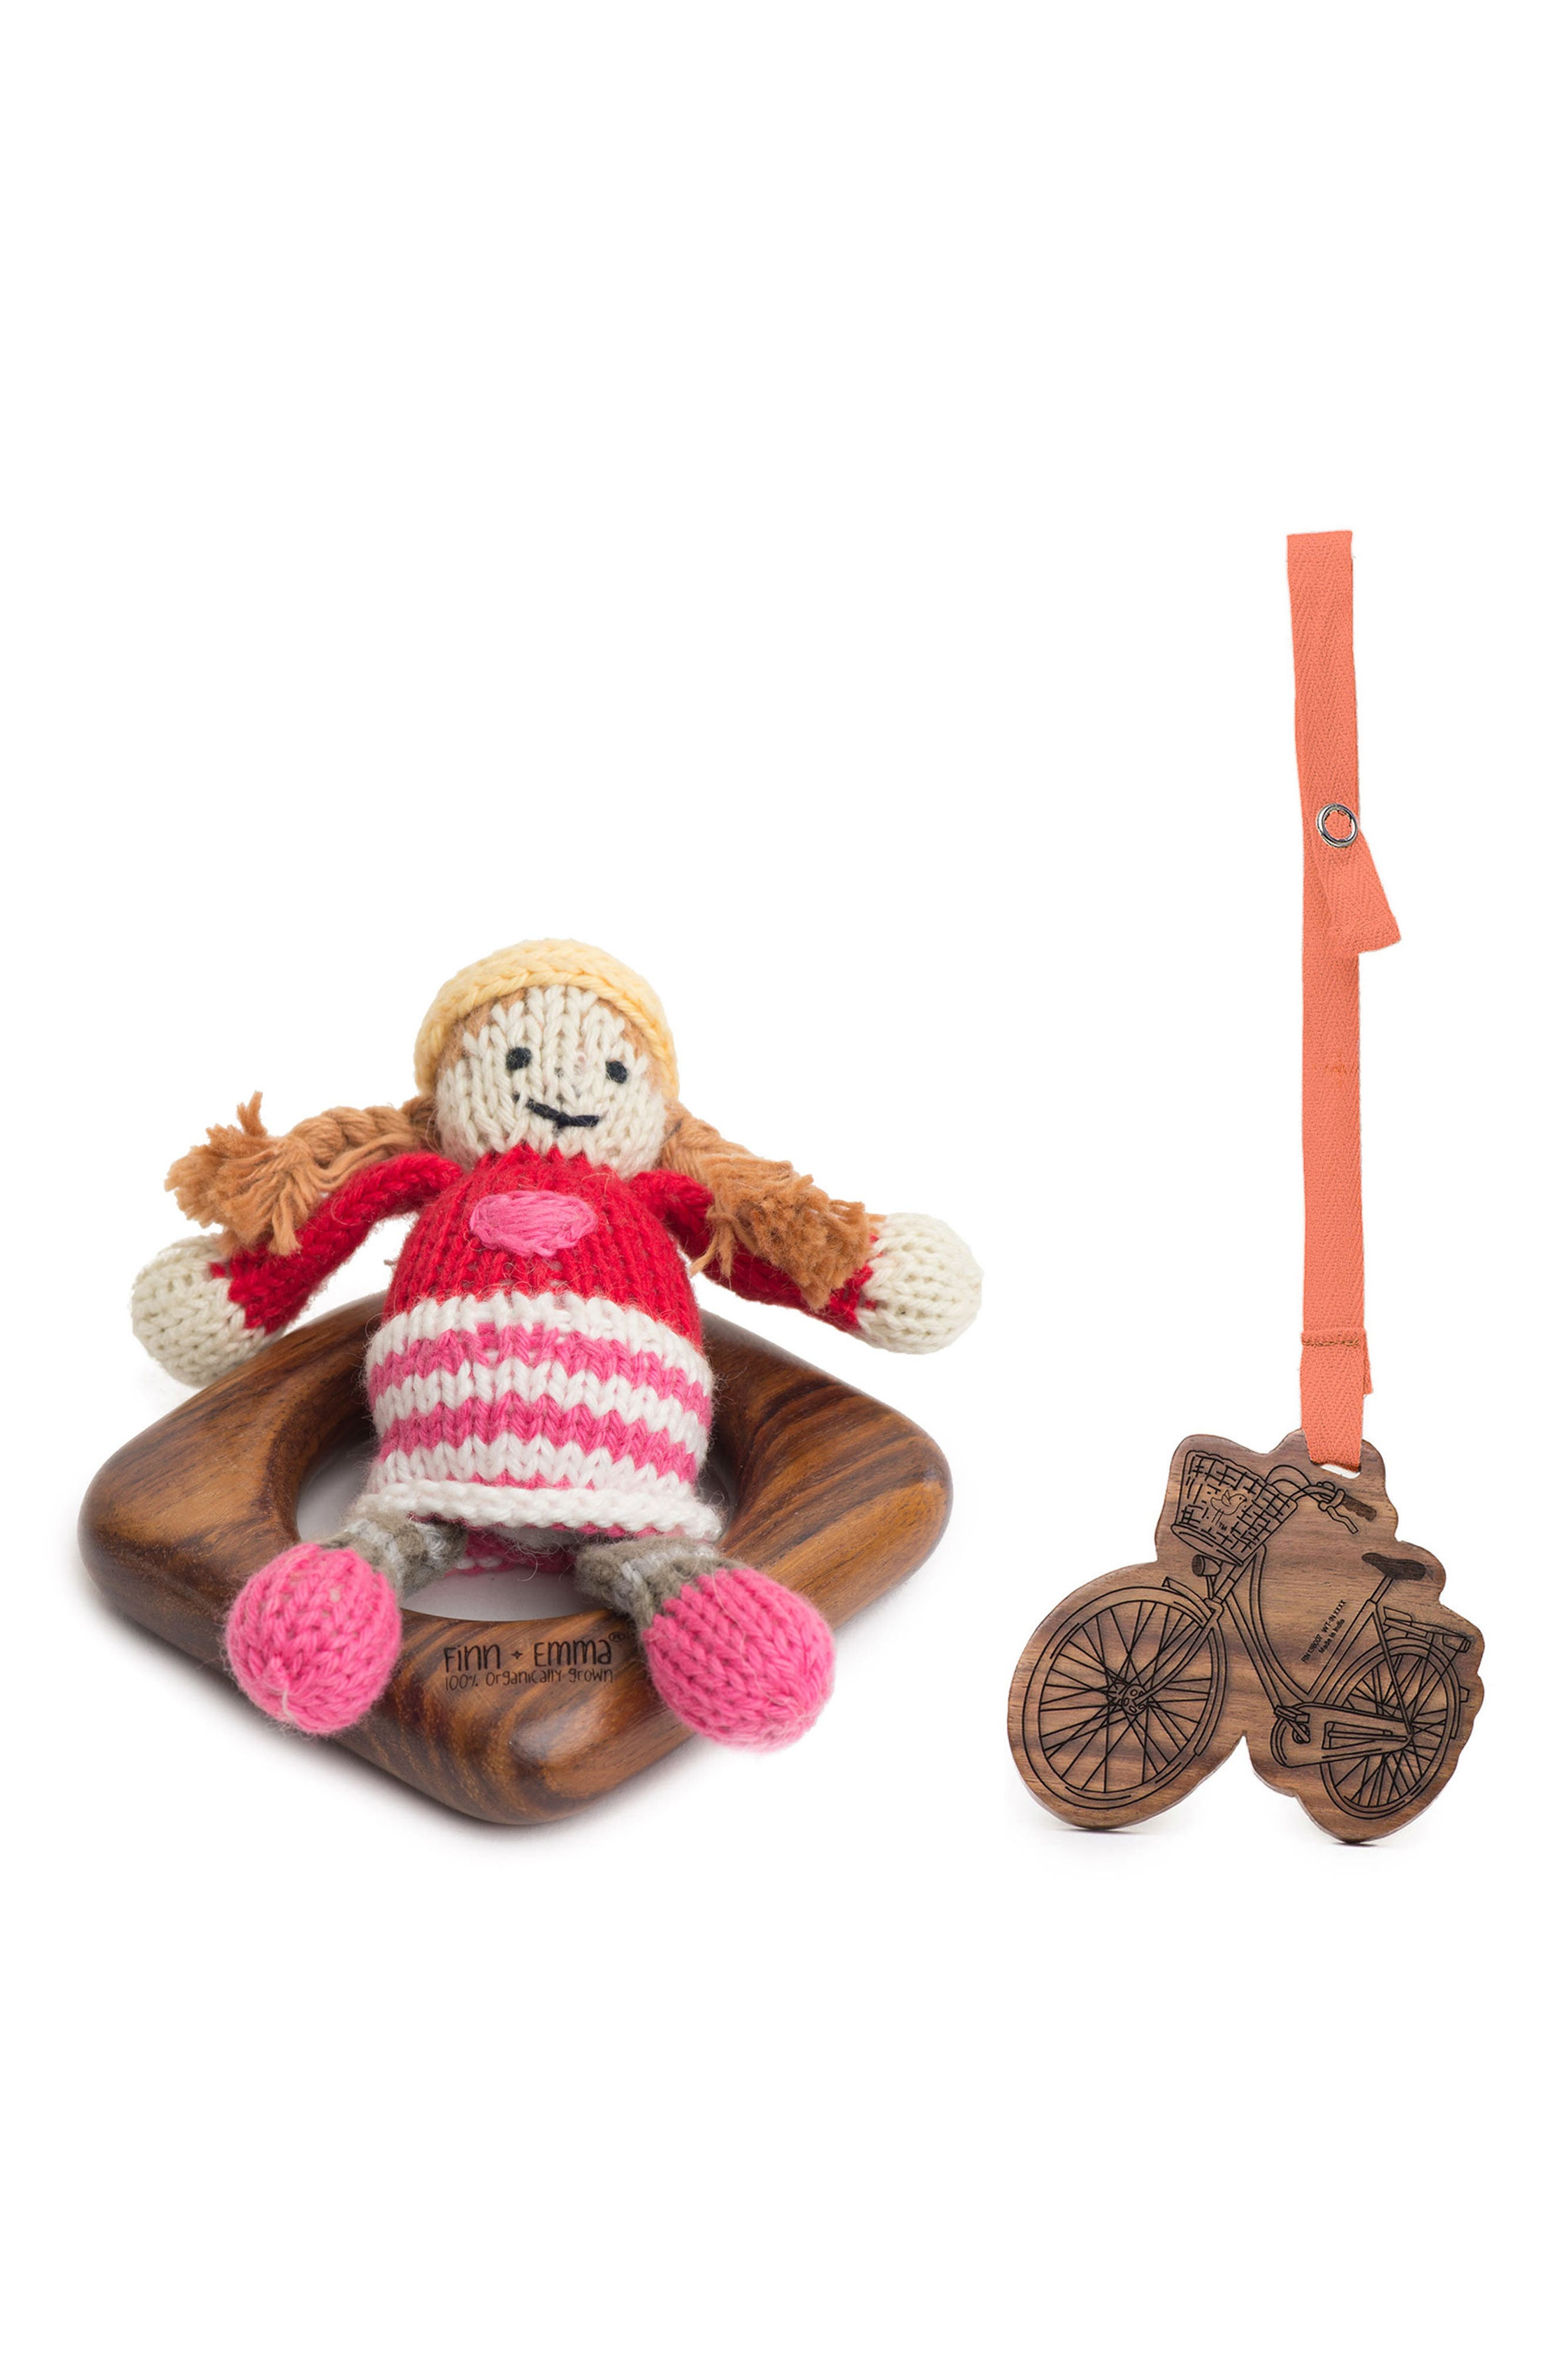 Main Image - Finn + Emma Clementine Teething Ring, Rattle & Stroller Buddy Set